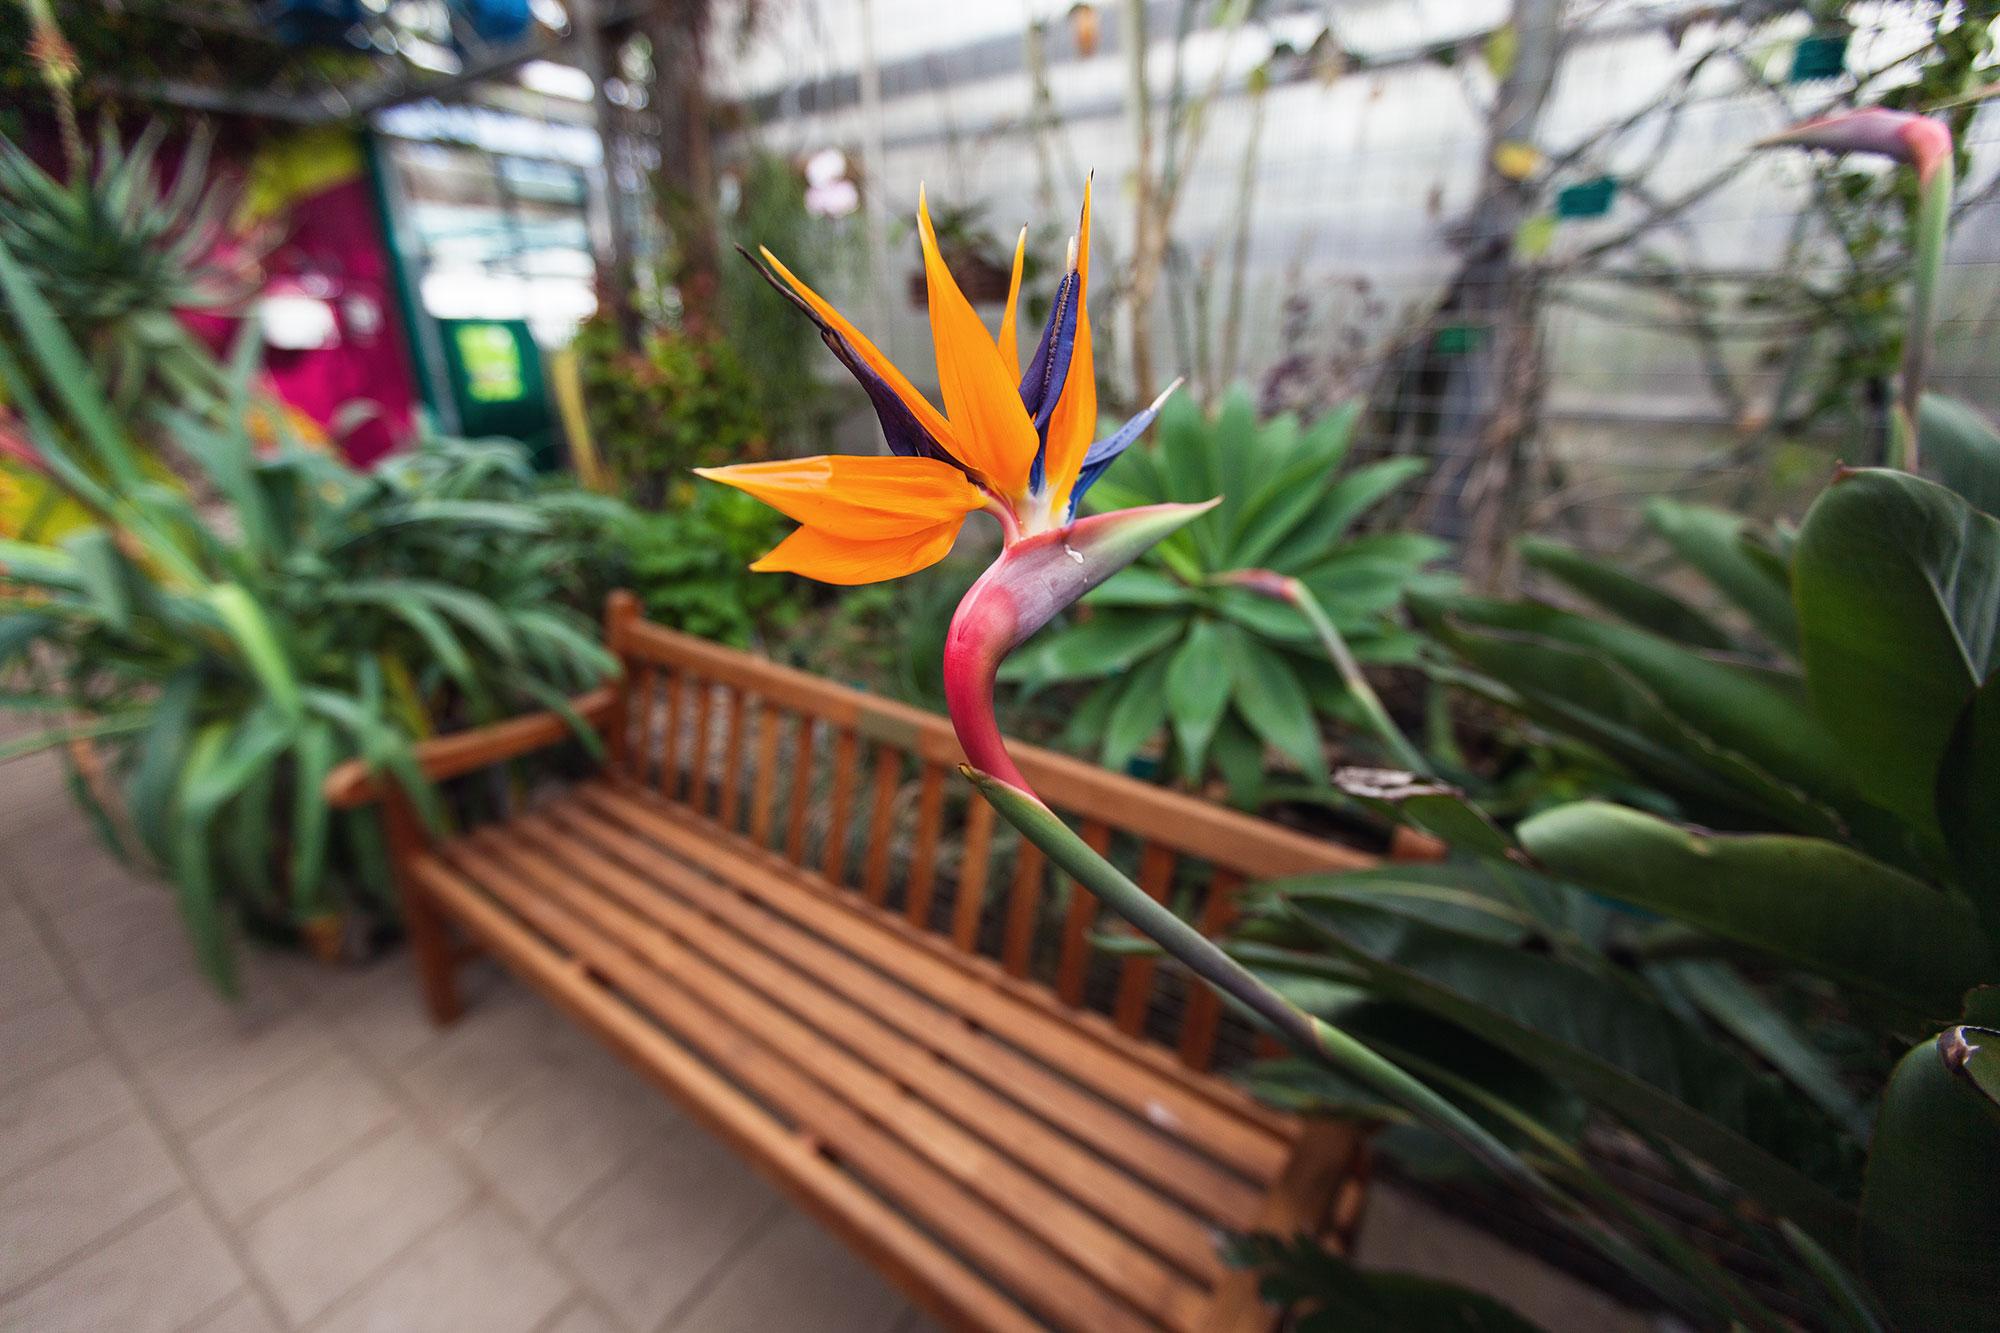 botanische tuin uithof